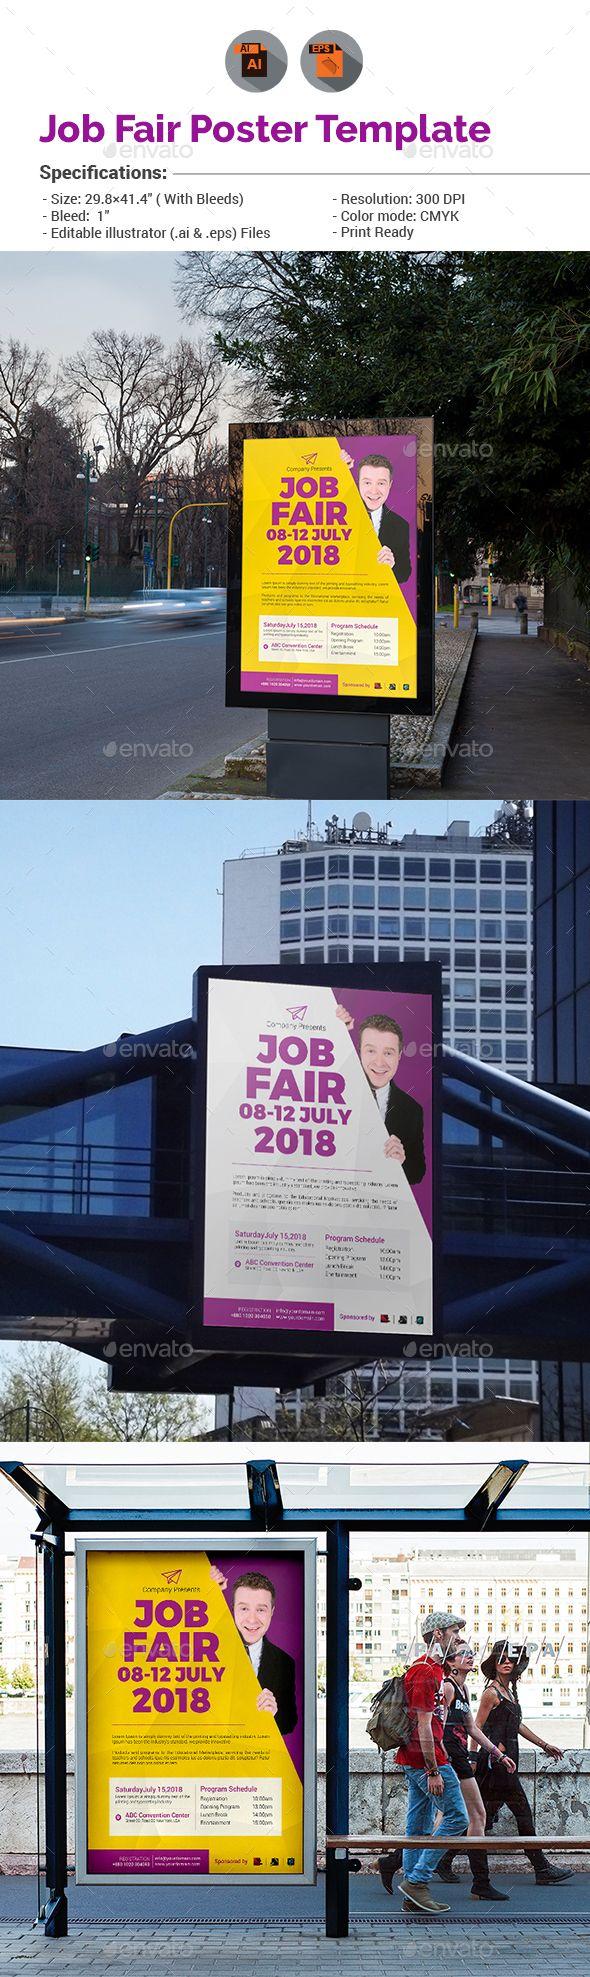 Banner design for job fair - 4 Multipurpose Flexible Poster Bundle Creative Design Signage And Print Templates